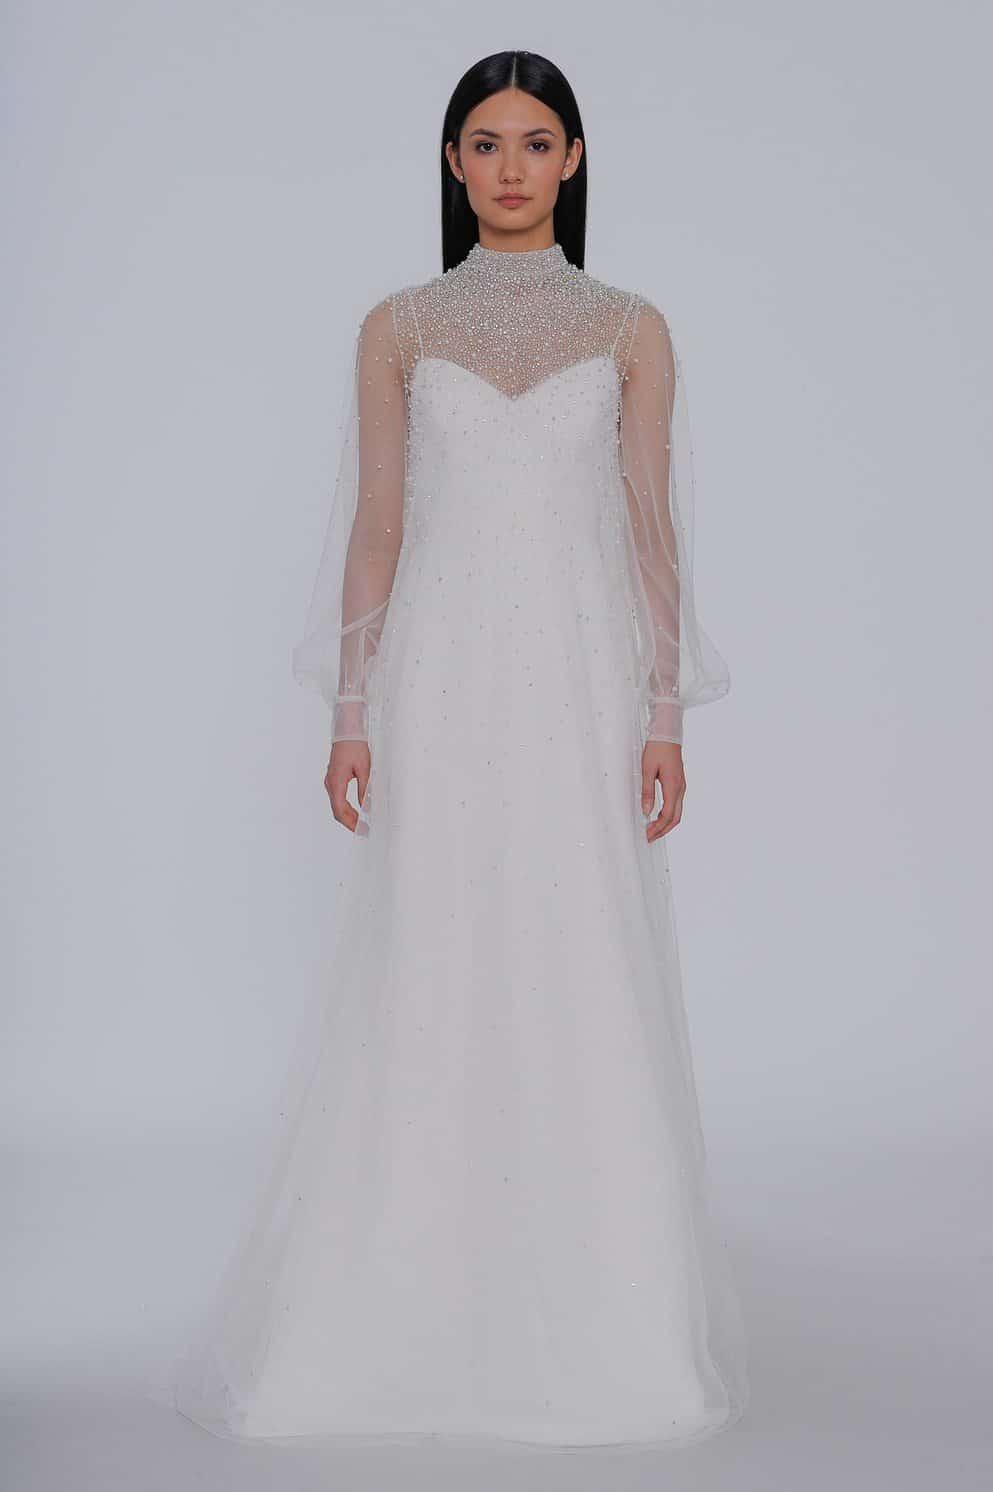 allison-webb-wedding-dresses-spring-2019-007